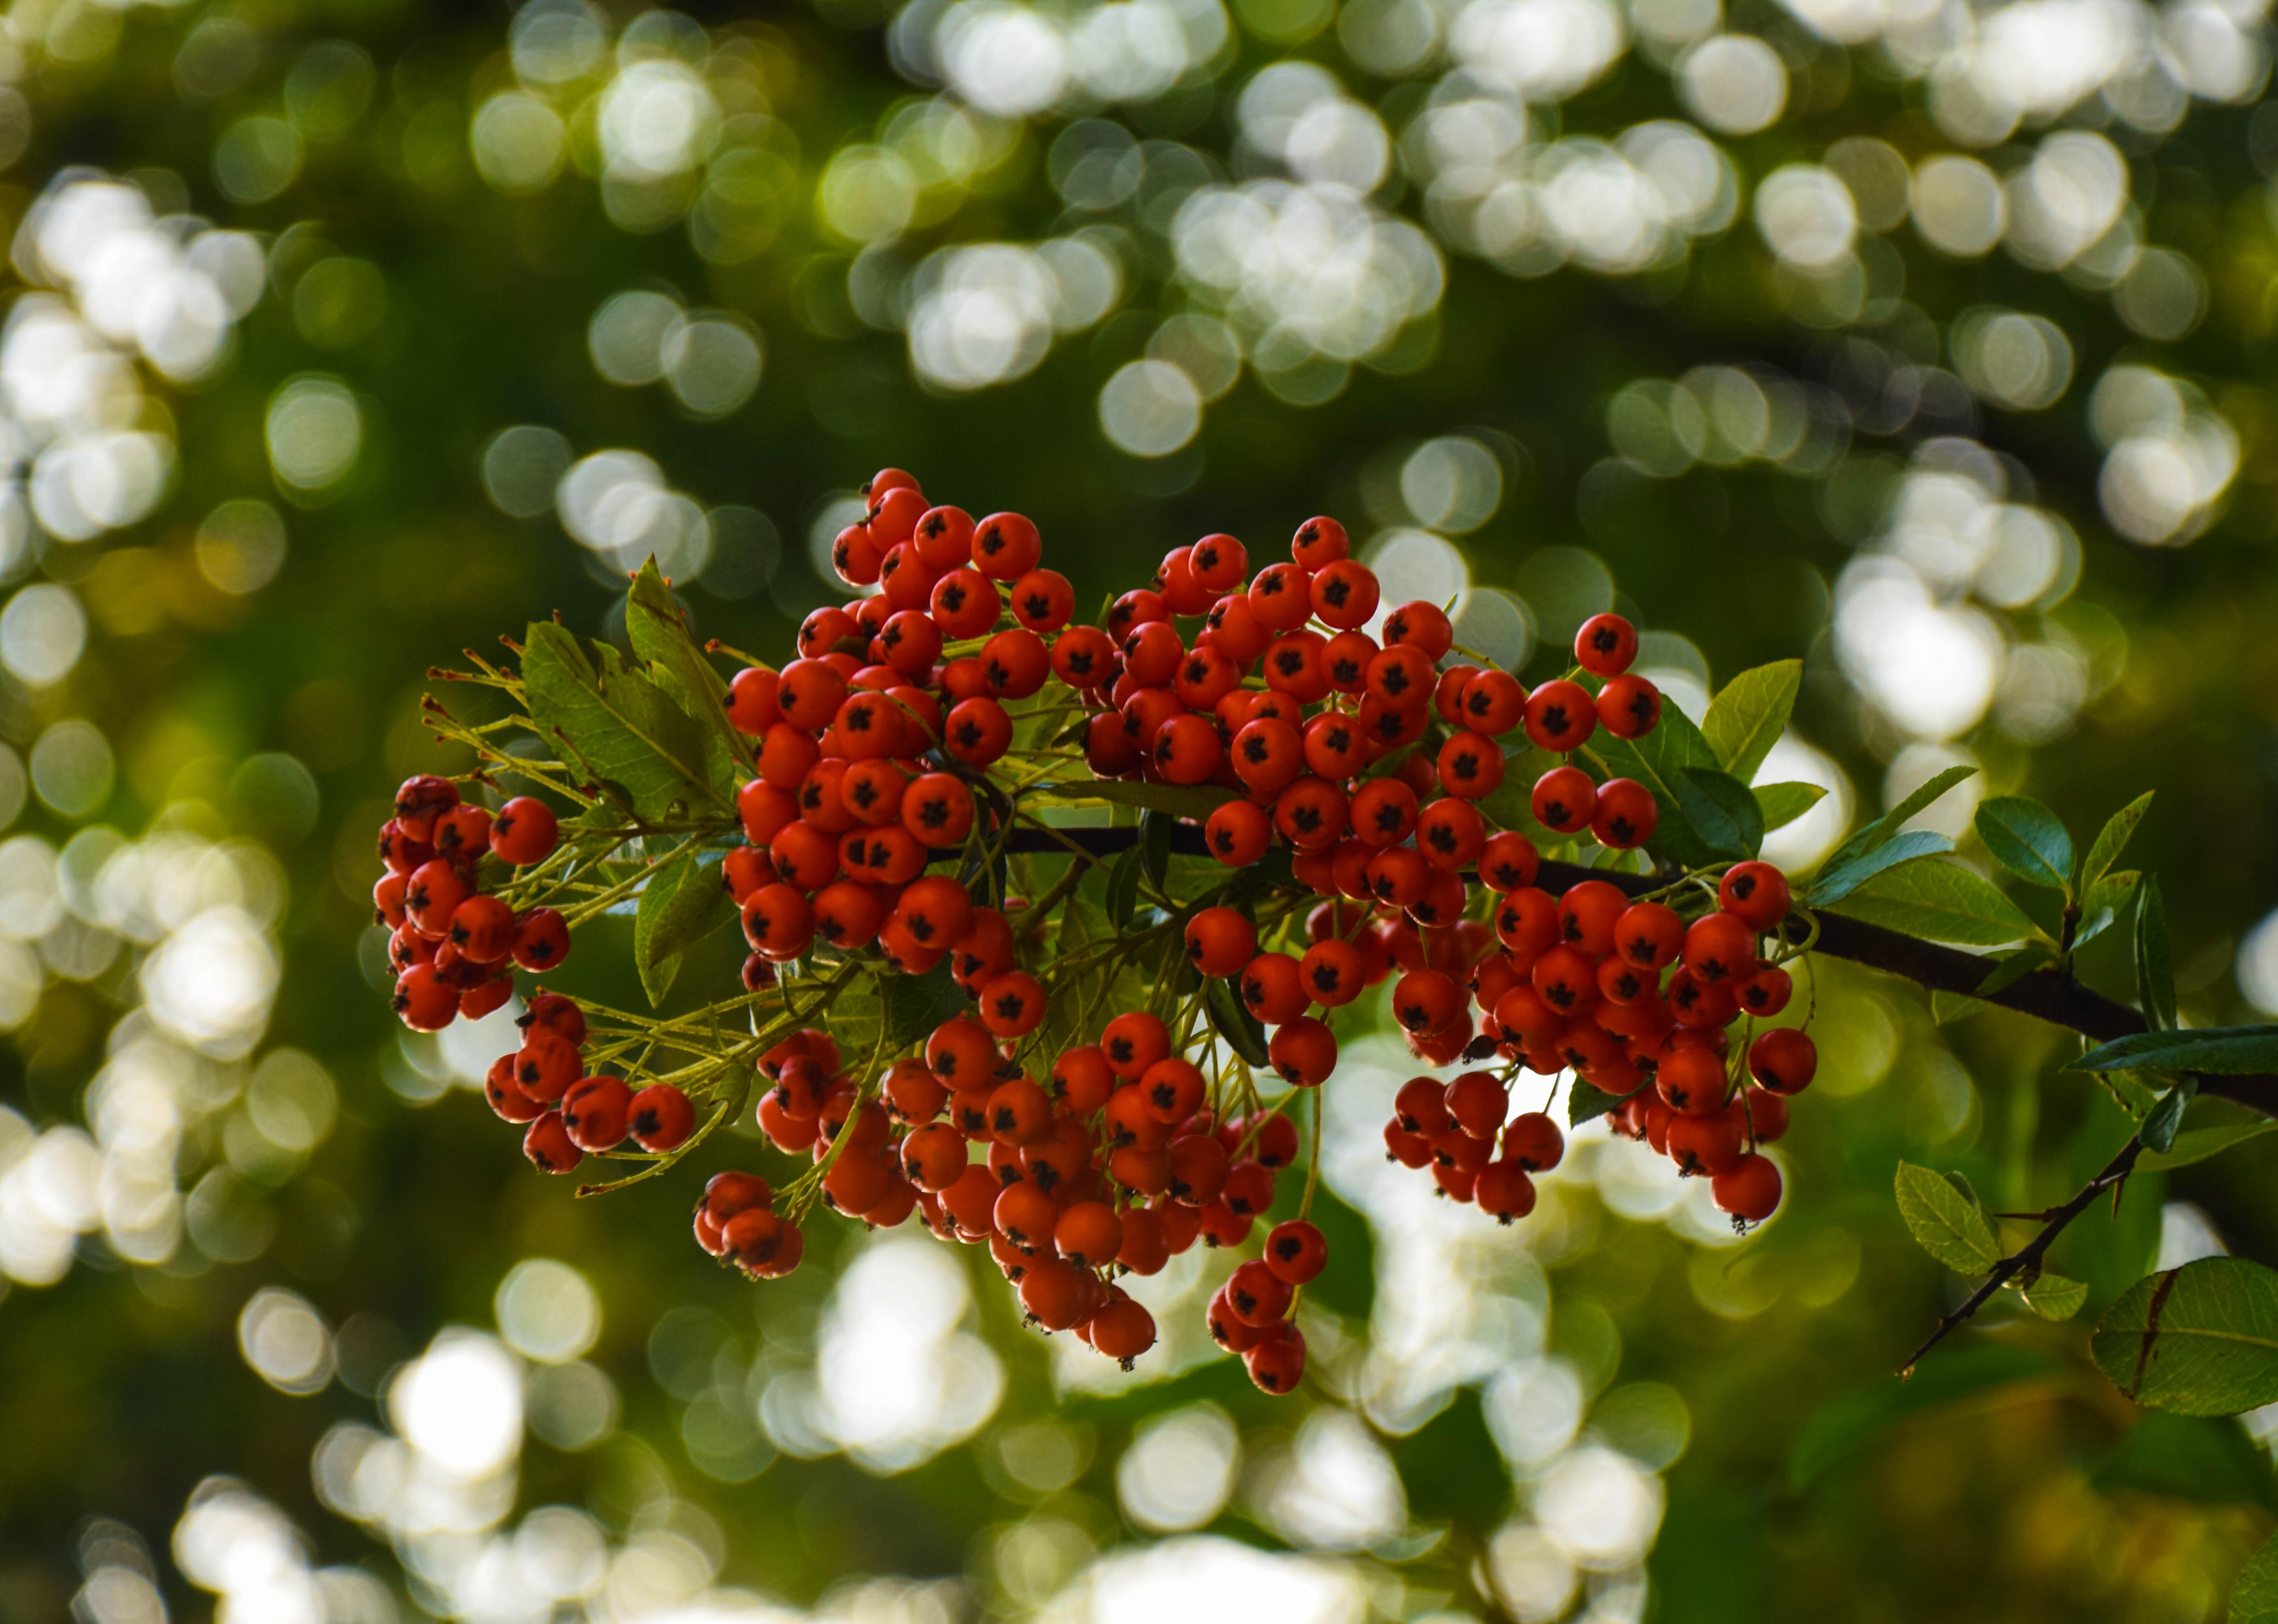 Fondos de pantalla : otoño, hojas, comida, jardín, naturaleza, rojo ...